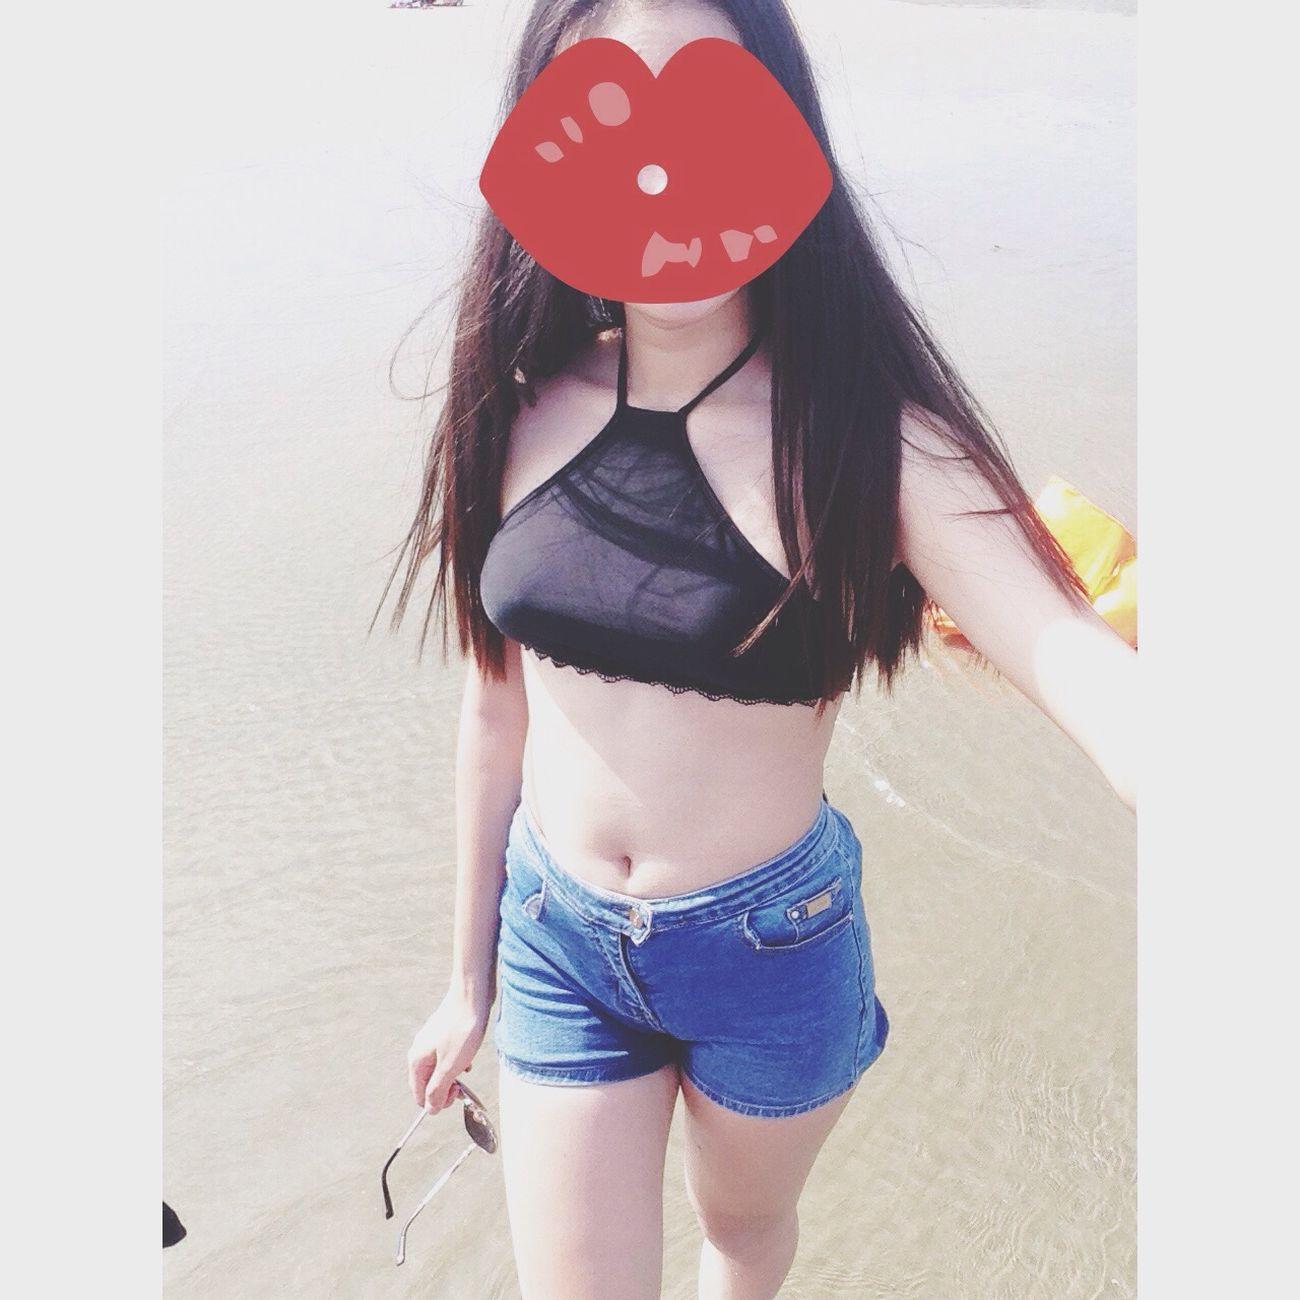 Beach 😍😙😙😙😍😍😙😻😻😻 Hi!